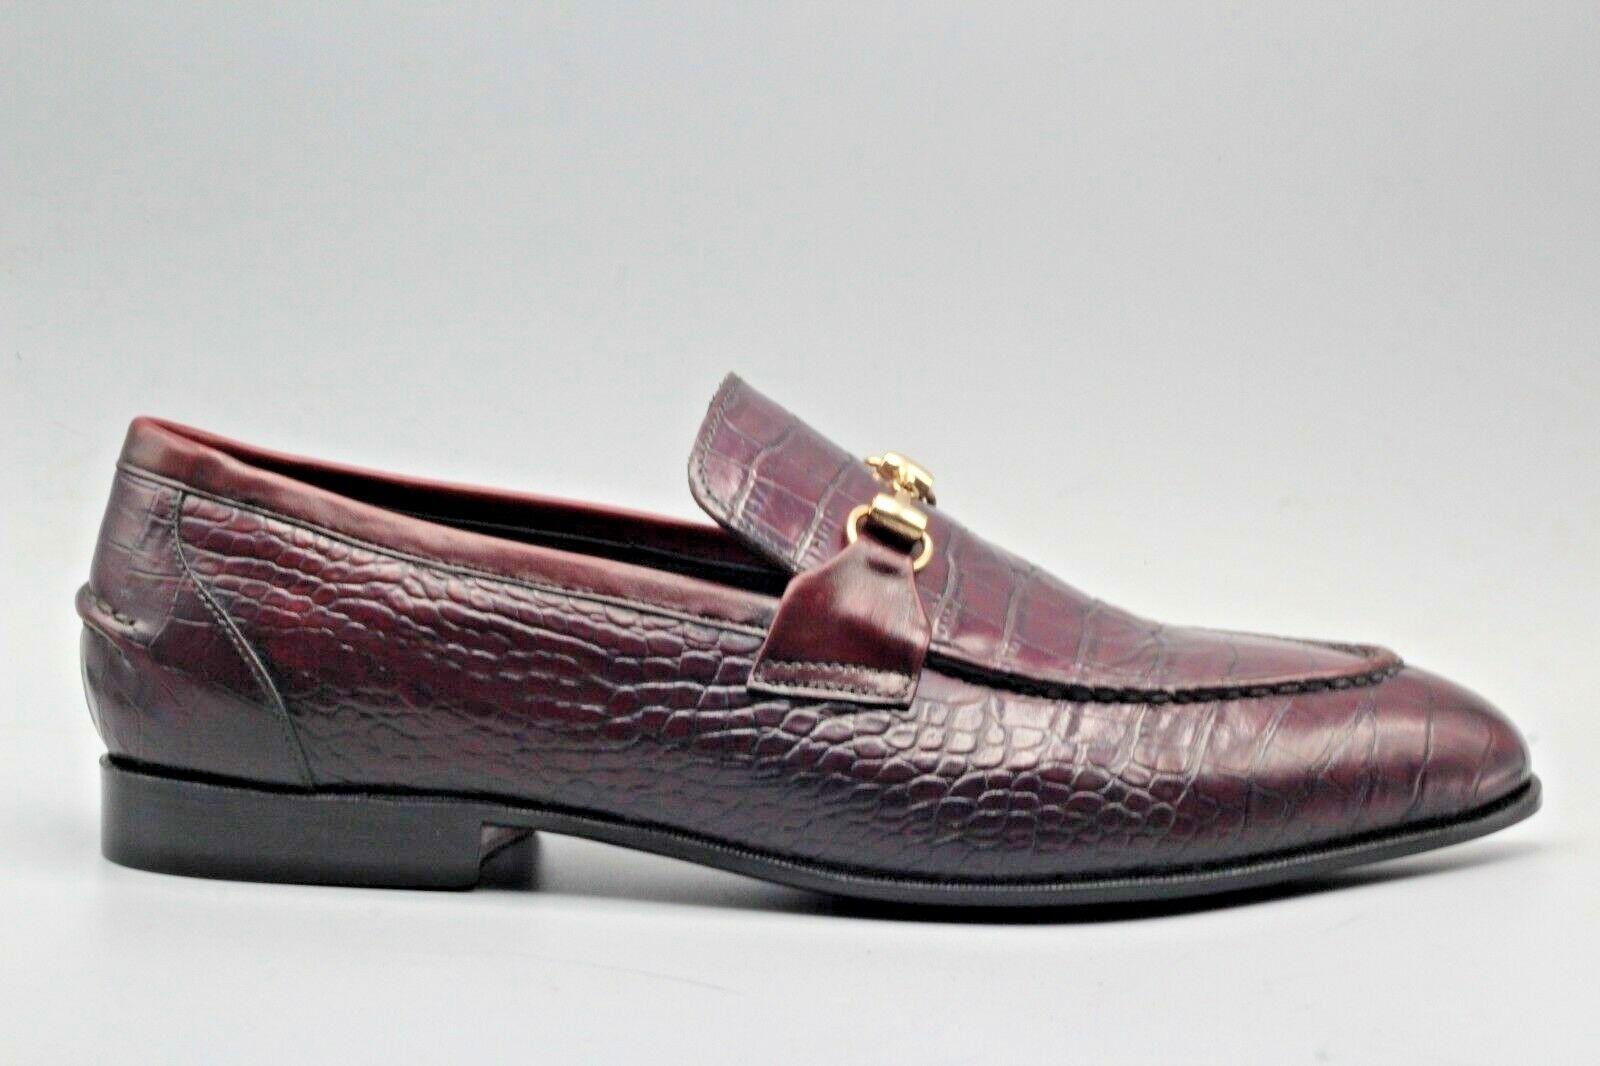 d7cec7d221db1 Men's Bespoke Moccasin Leather Crocodile Shaded Purple & Brown ...